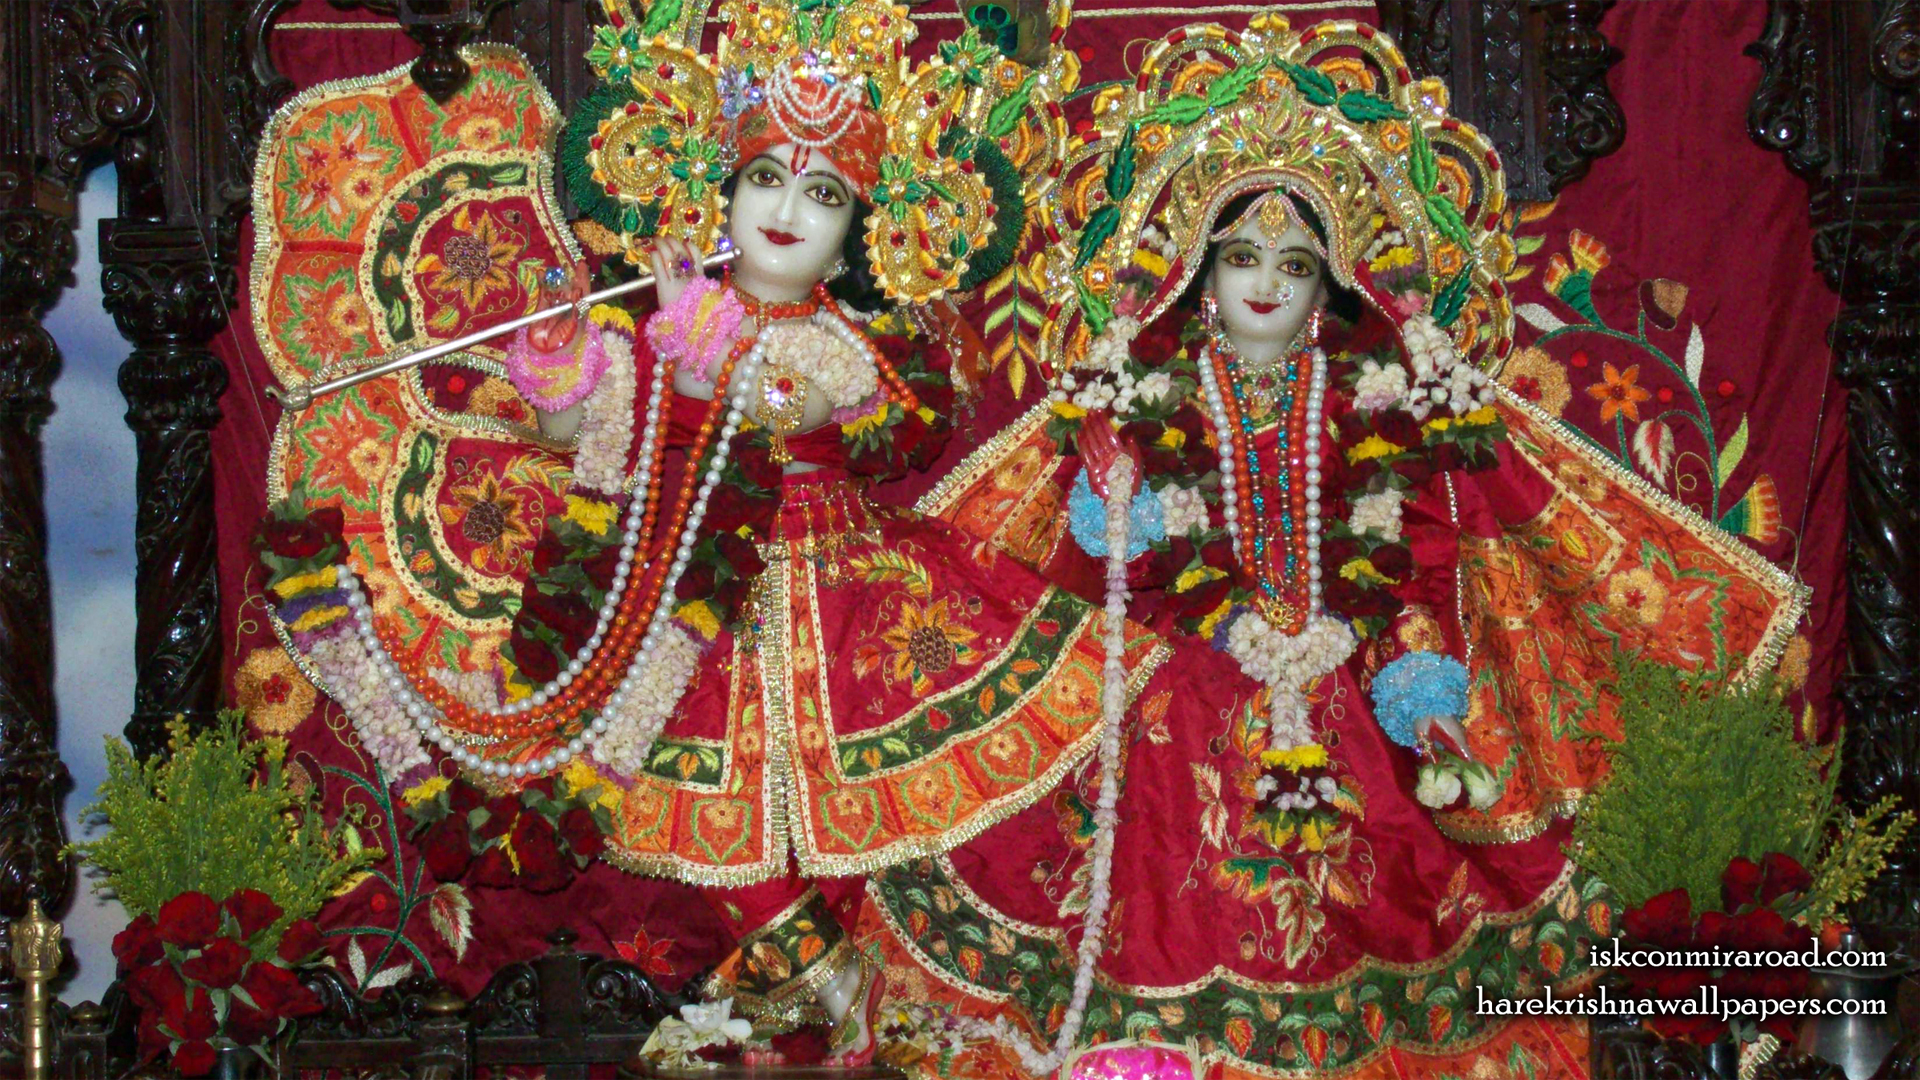 Sri Sri Radha Giridhari Wallpaper (014) Size 1920x1080 Download